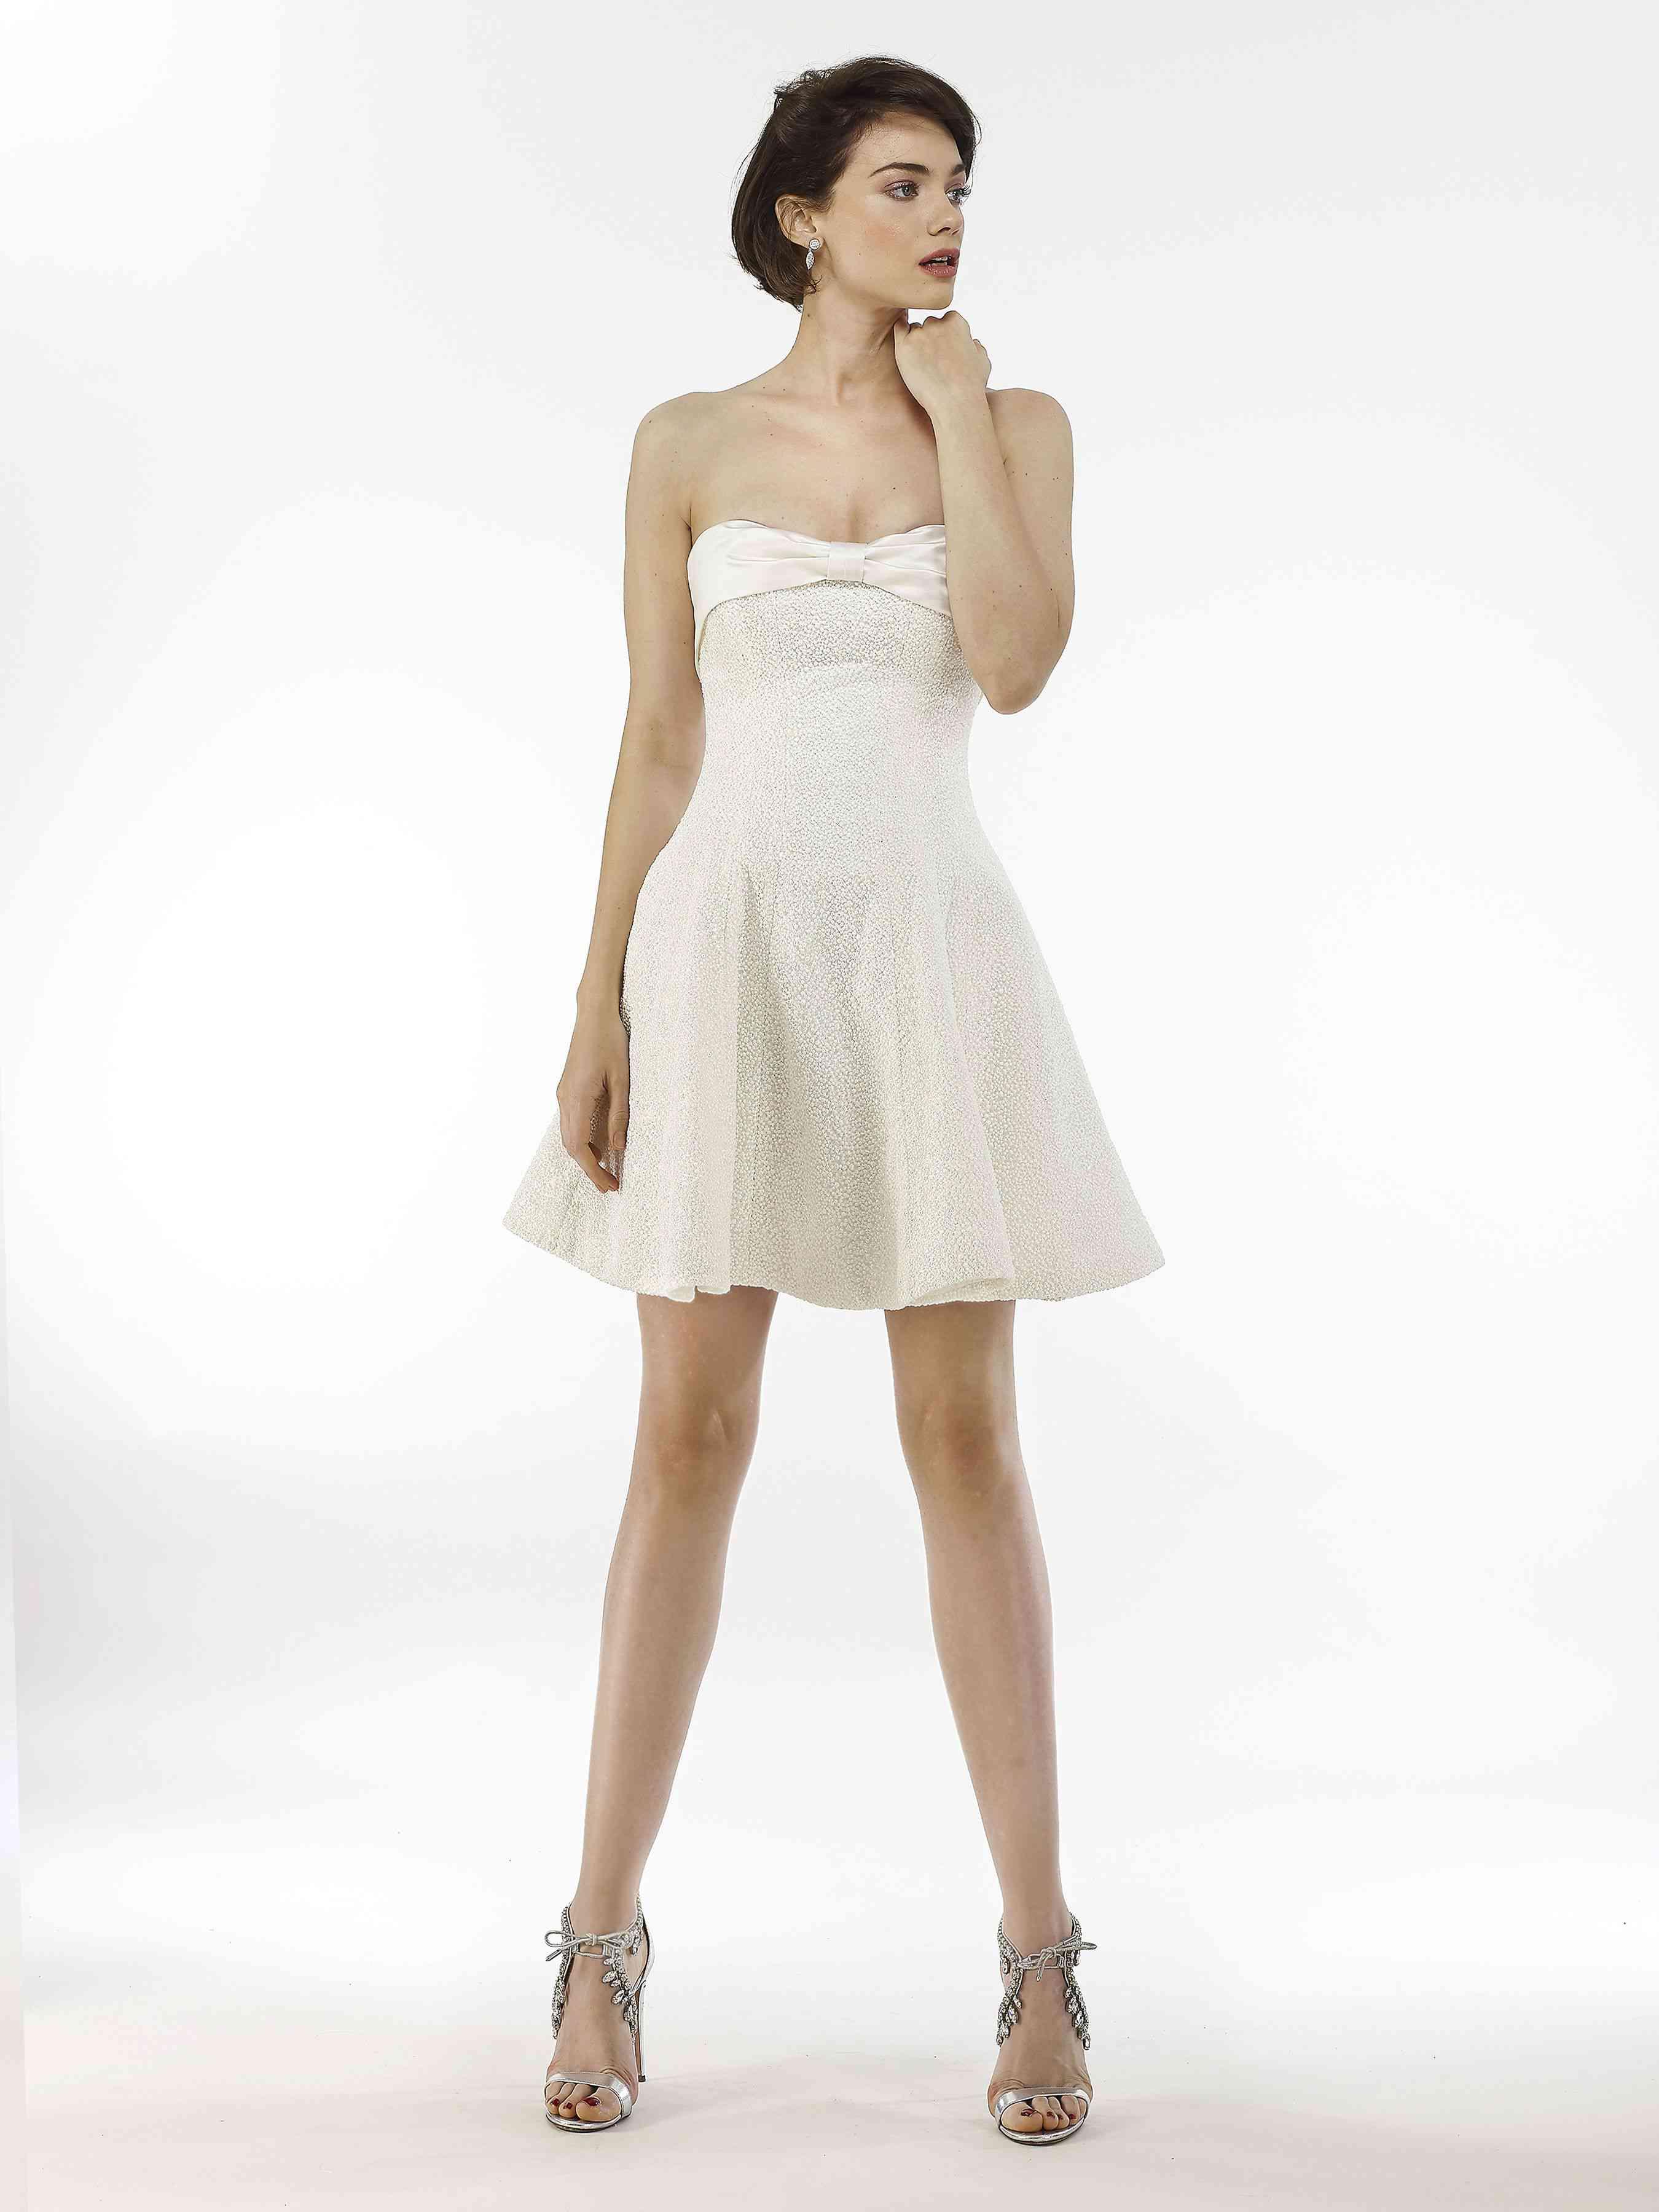 Model in strapless mini dress with flared skirt